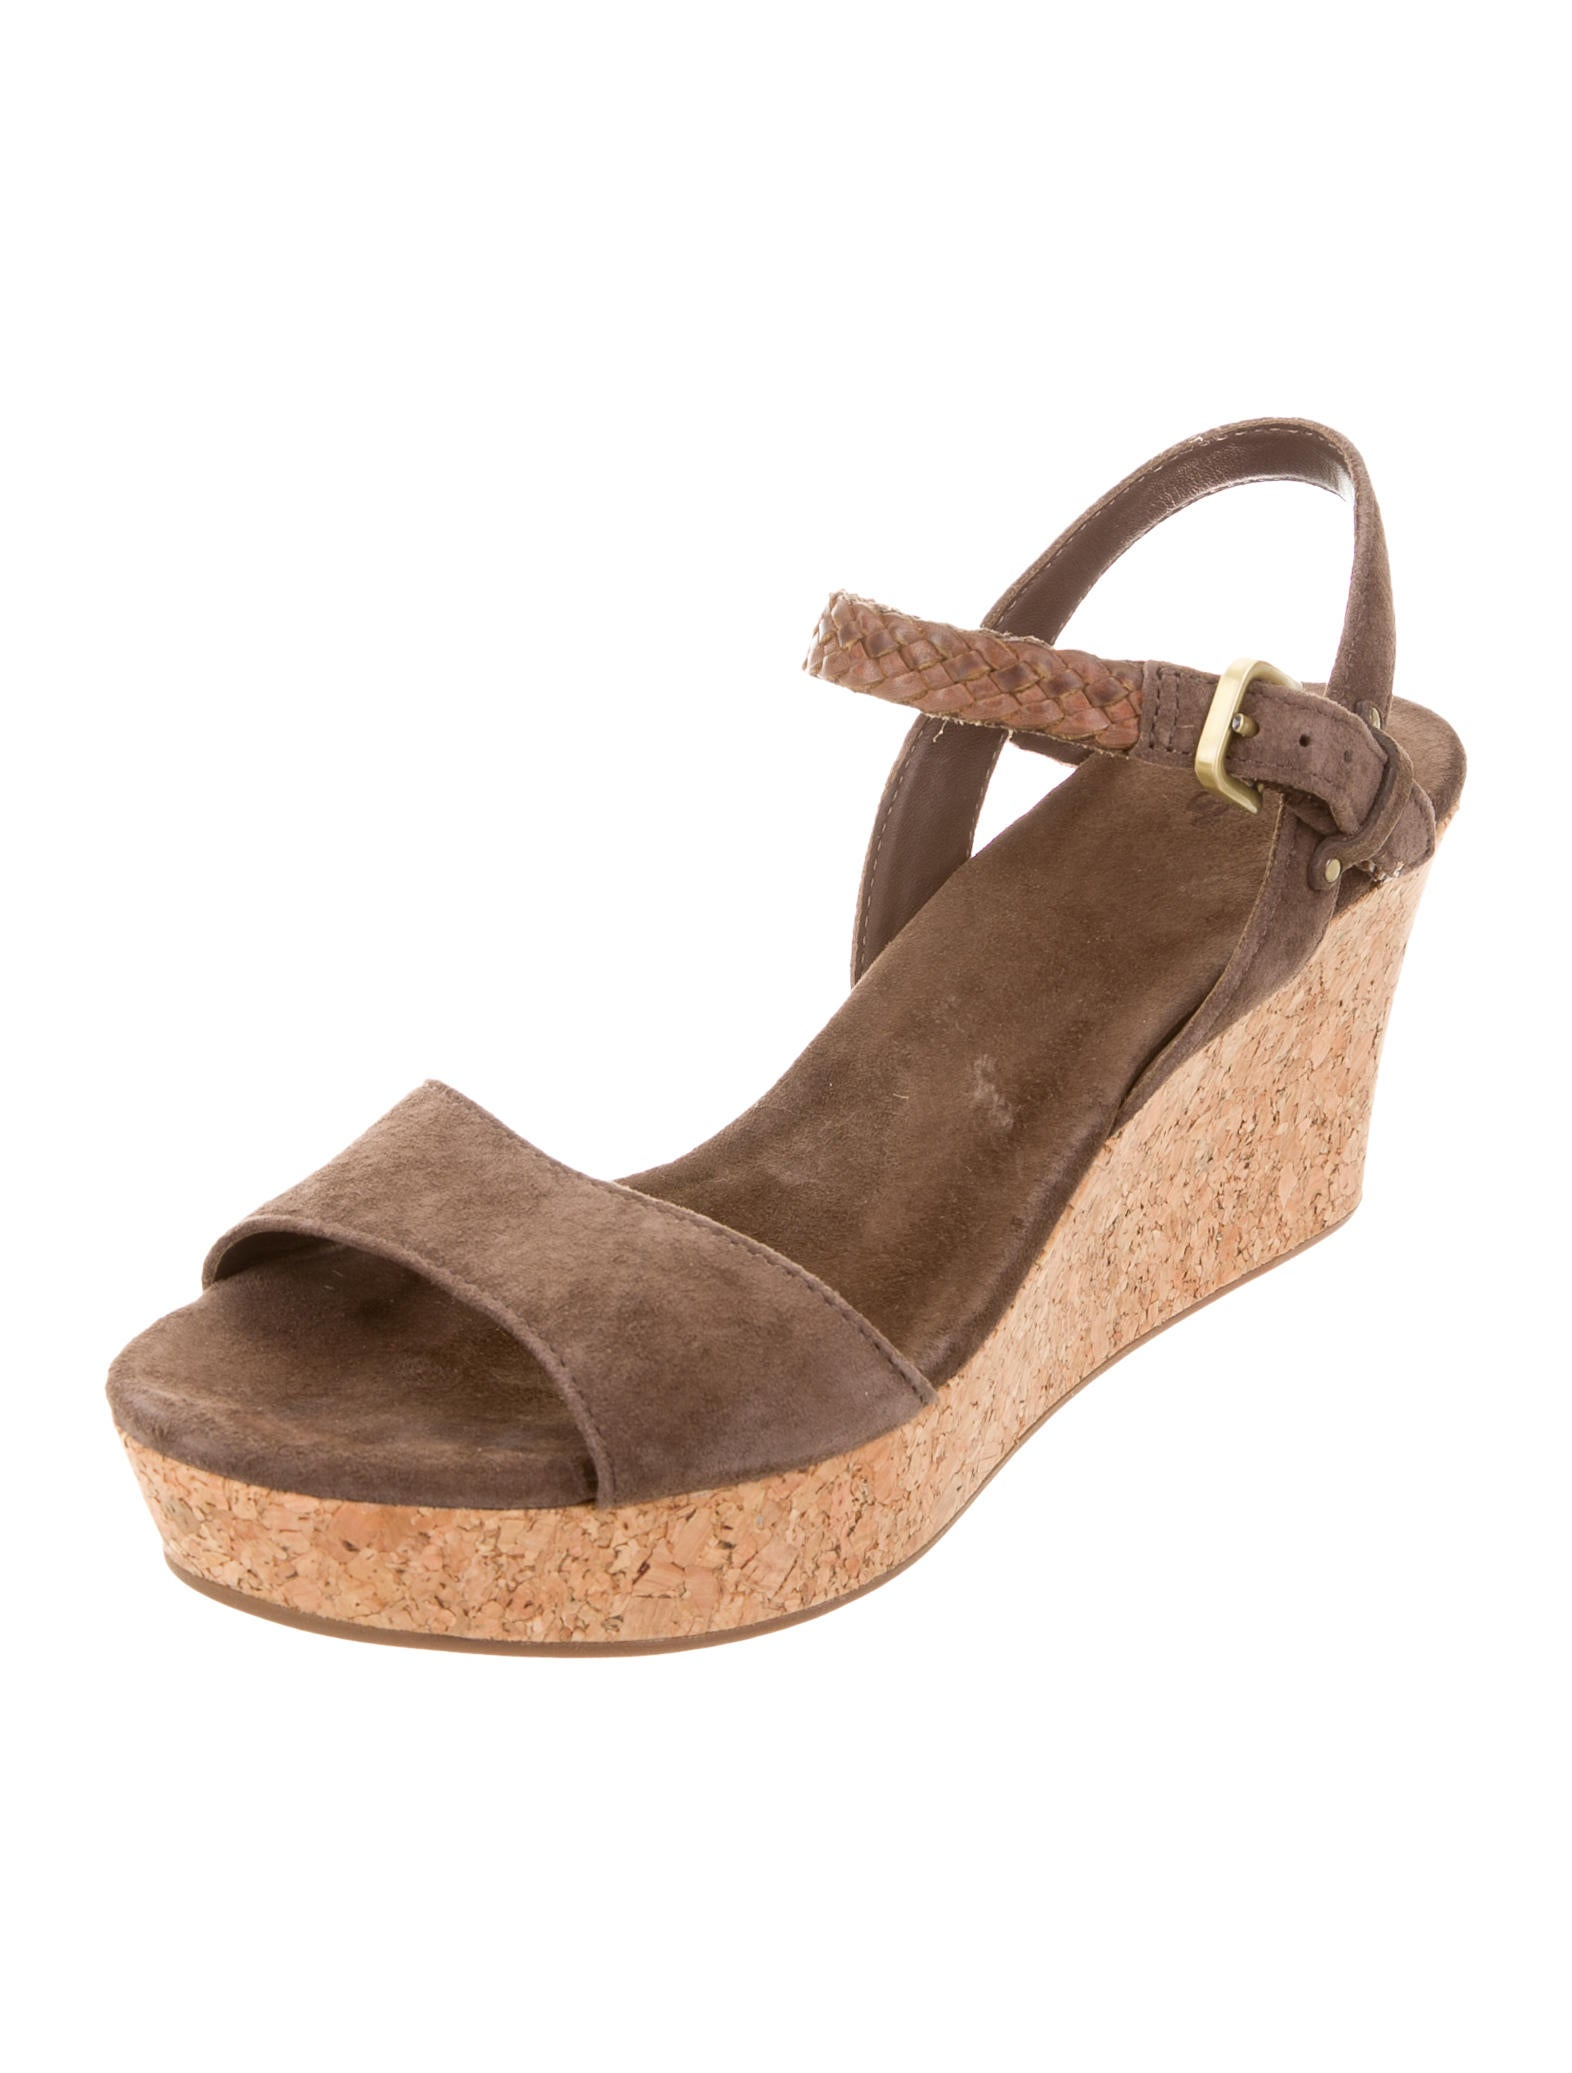 ugg australia d alessio platform wedges shoes